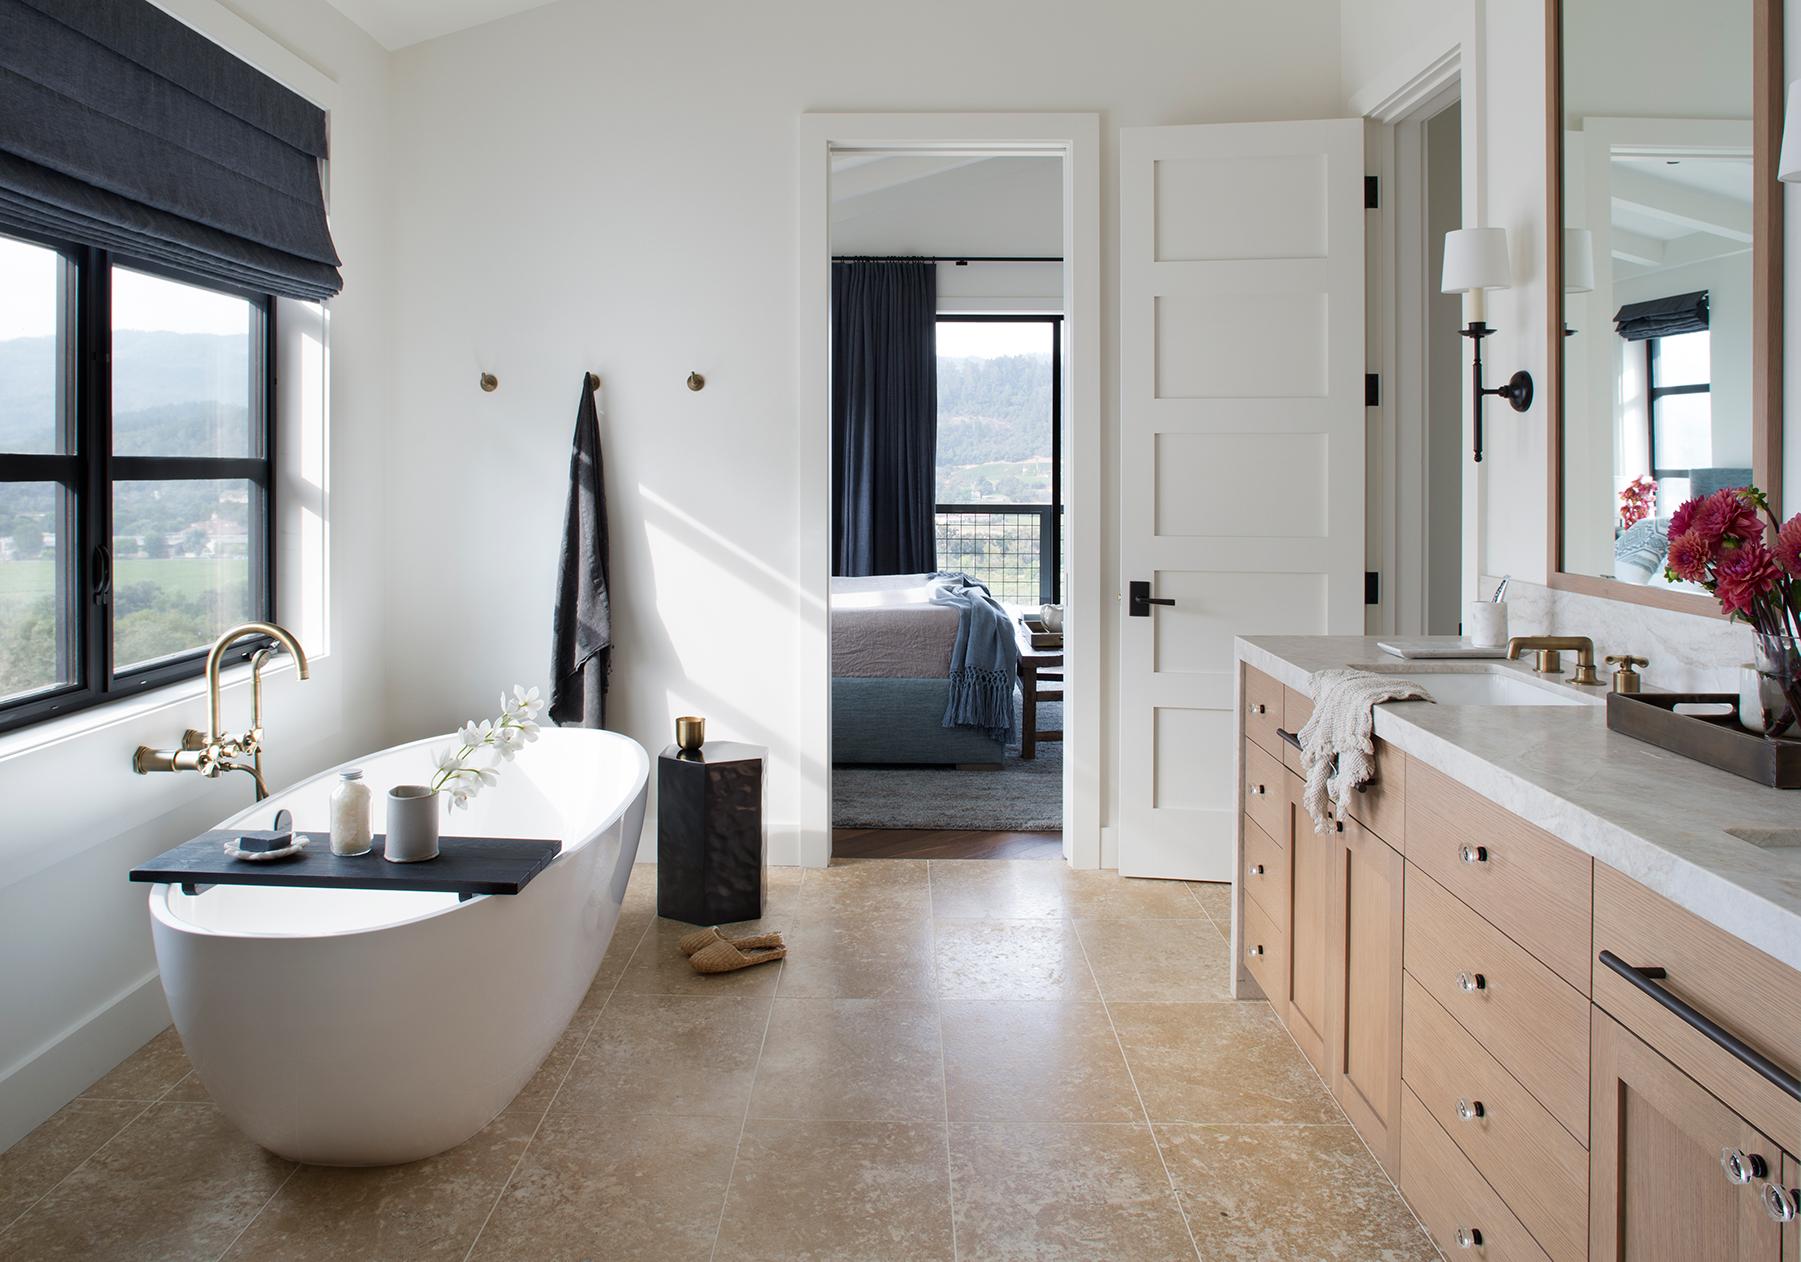 Jennifer_robins_interiors_projects_st_helena_IIII_Conn_23_HR_bathroom_bathtub